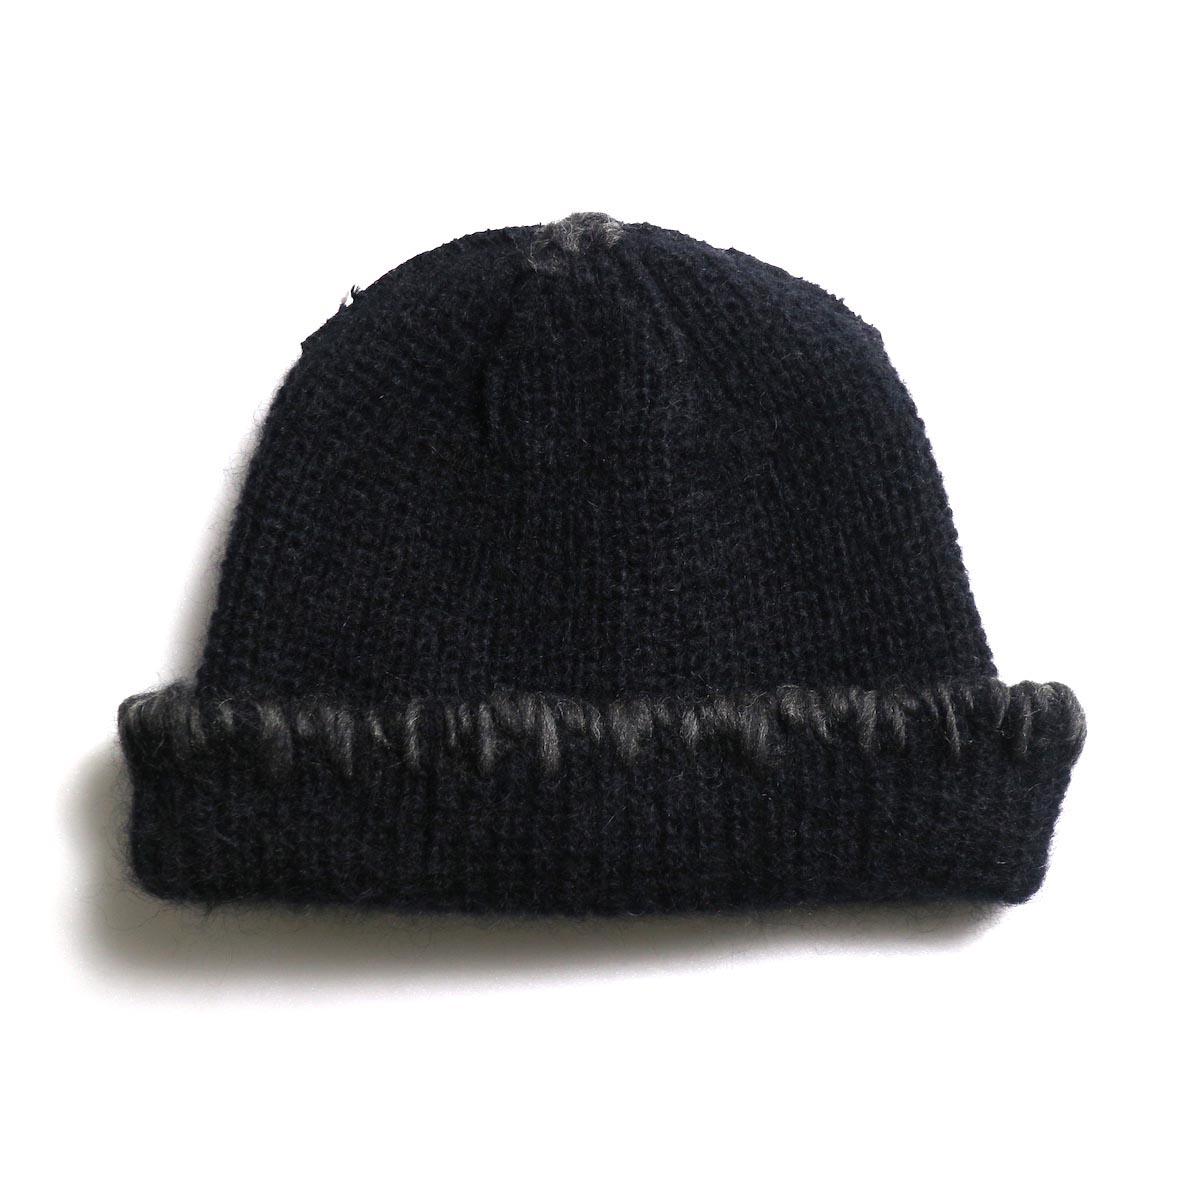 KIJIMA TAKAYUKI / Damage Knit Cap (KN182909) BLACK 正面